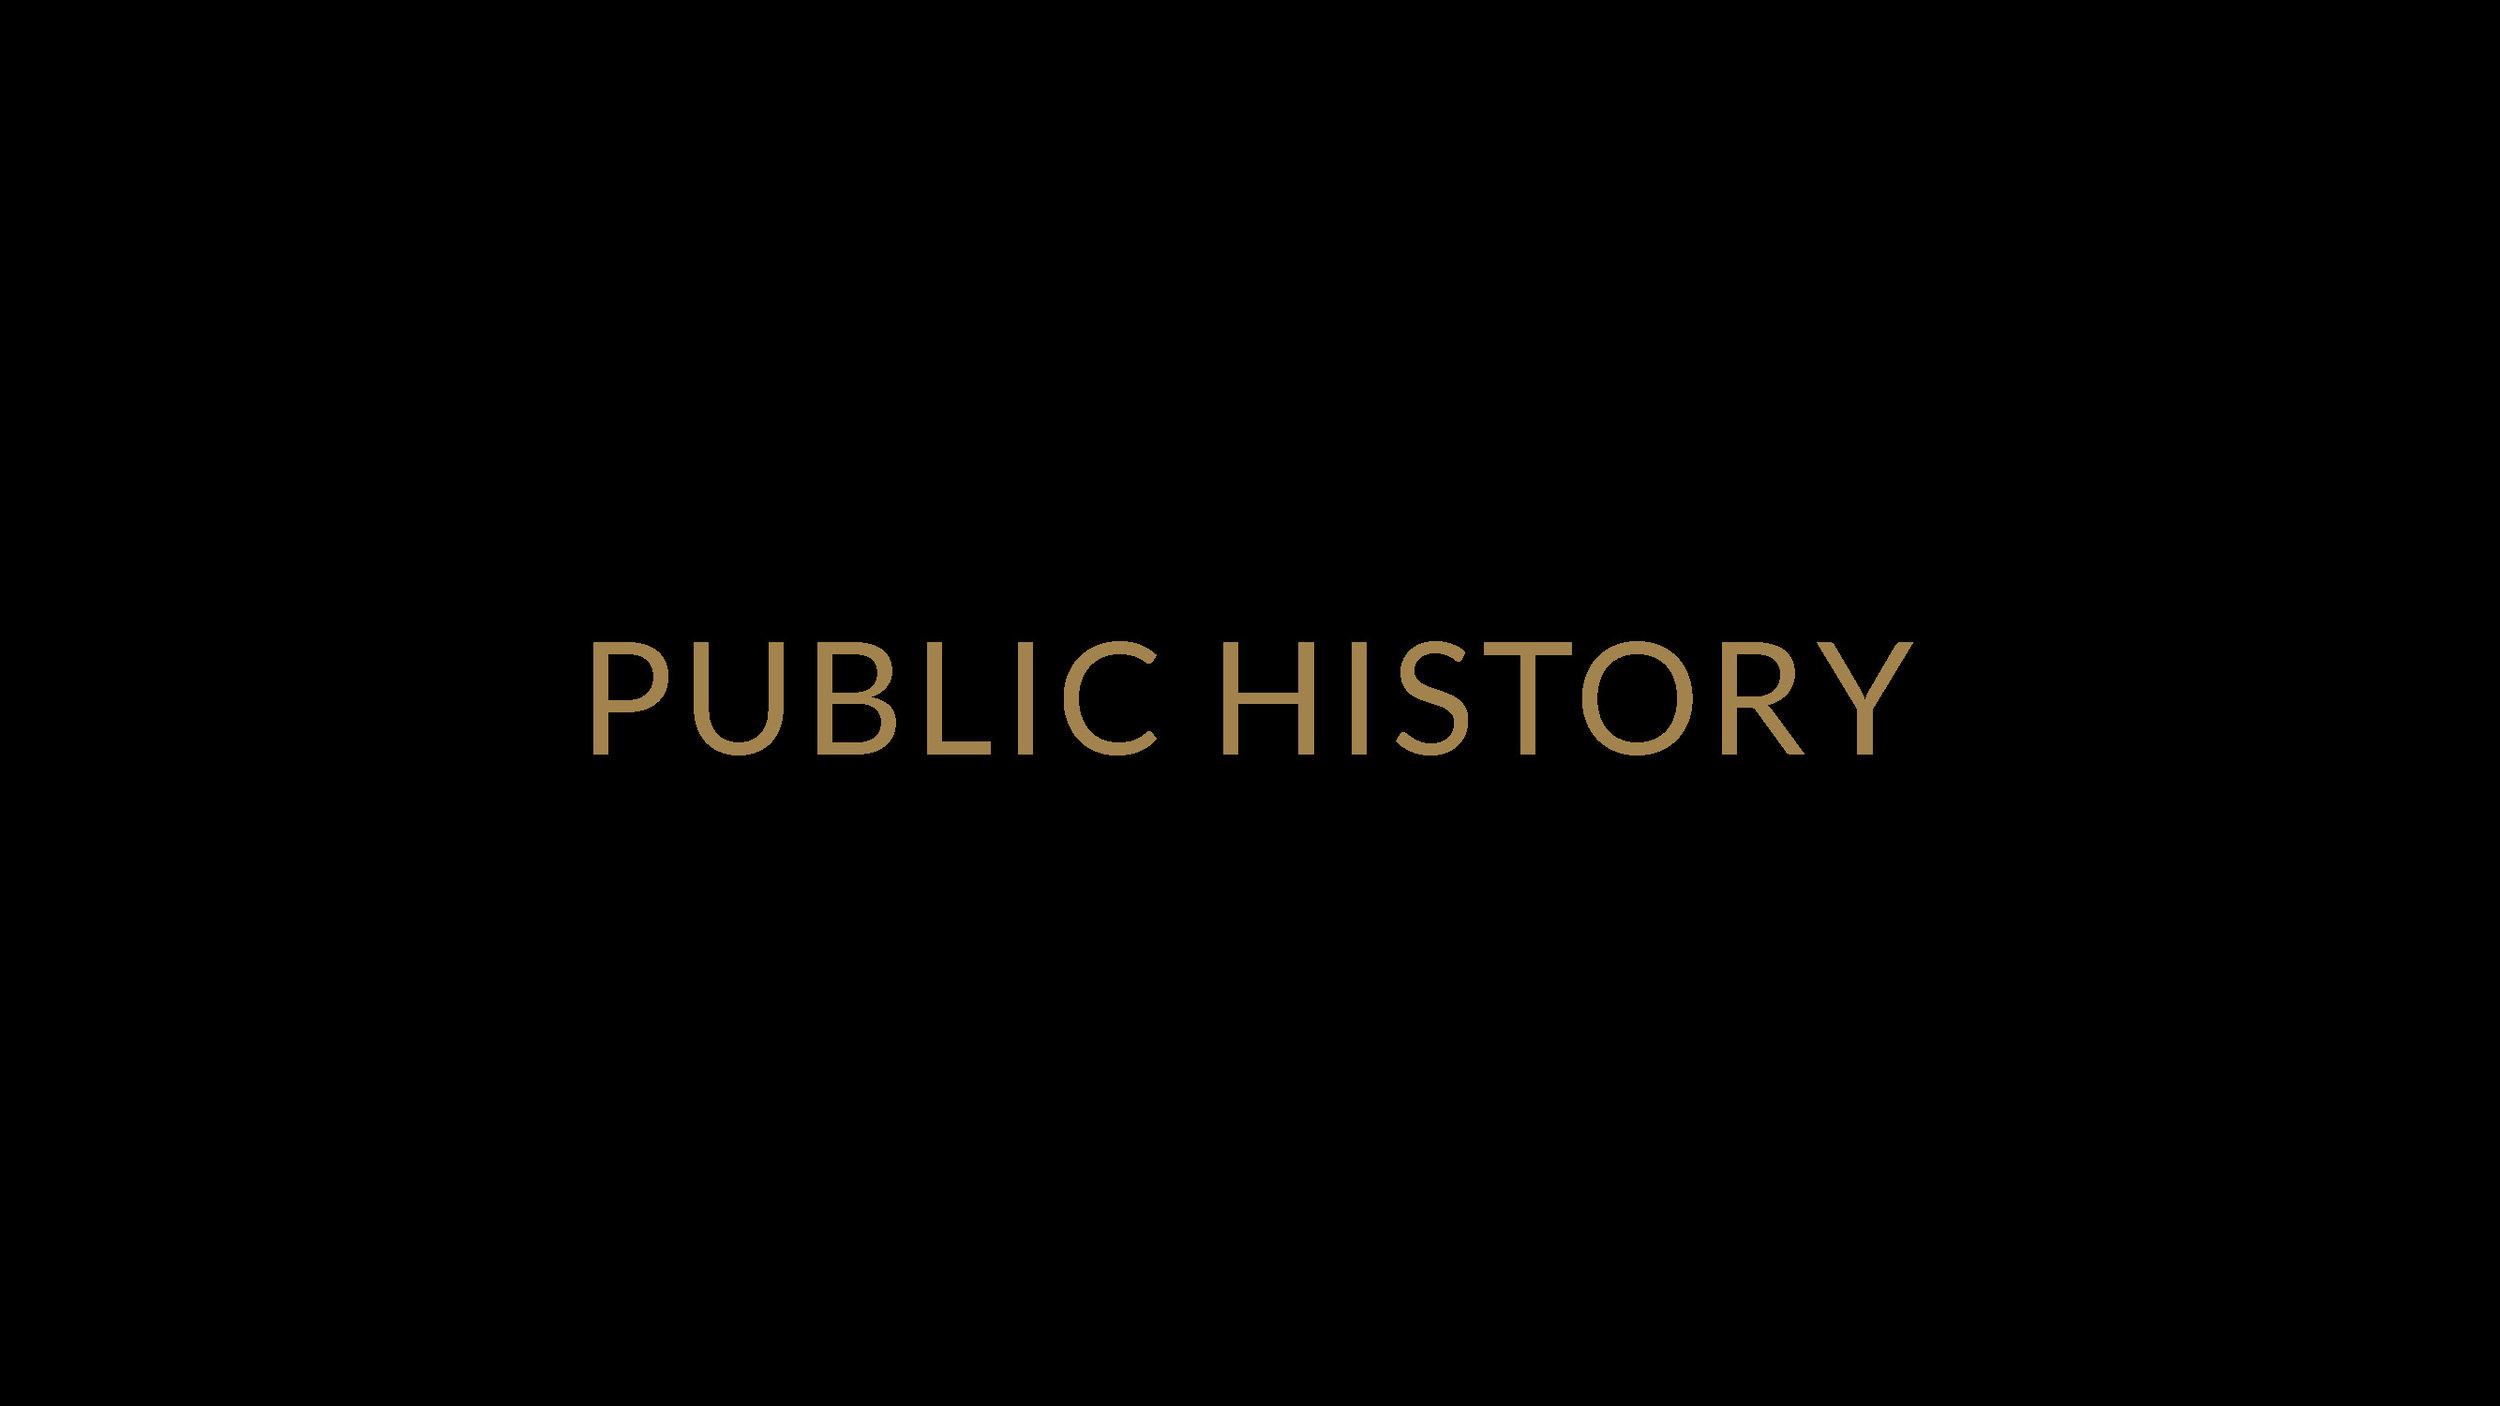 PUBLIC HISTORY.jpg